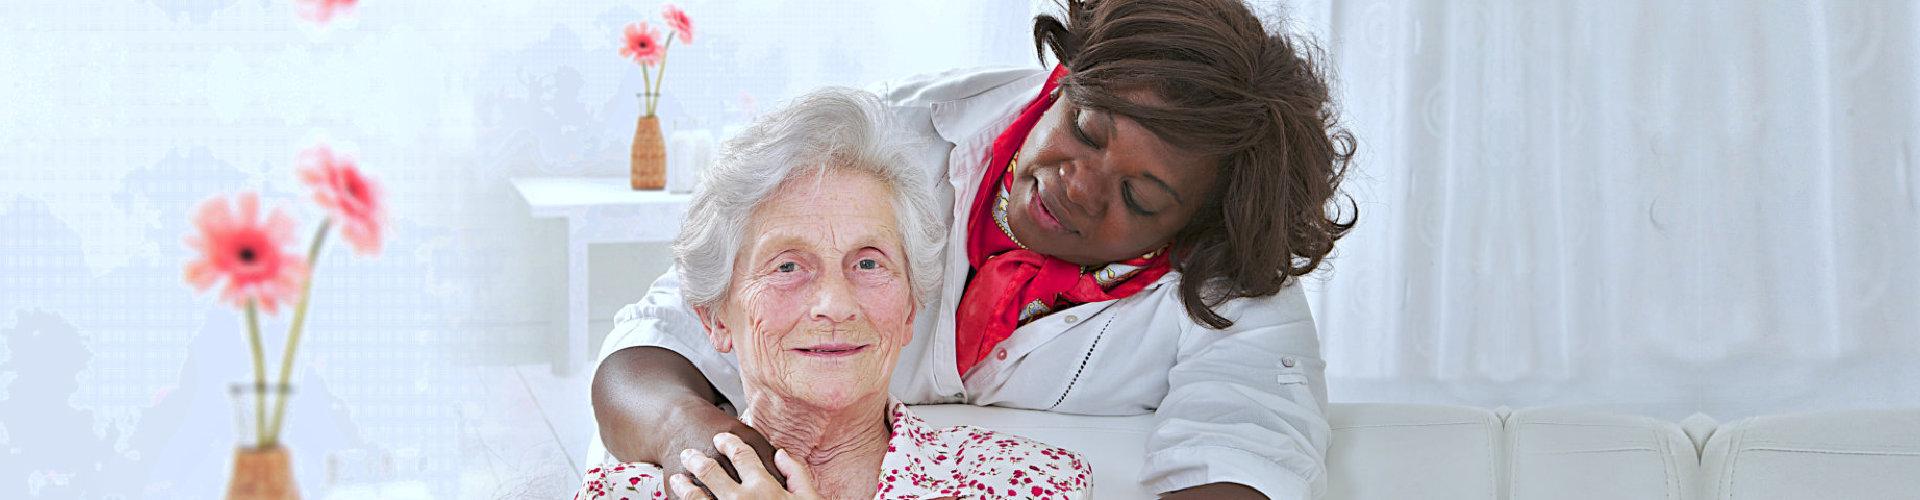 caregiver looking at the senior woman